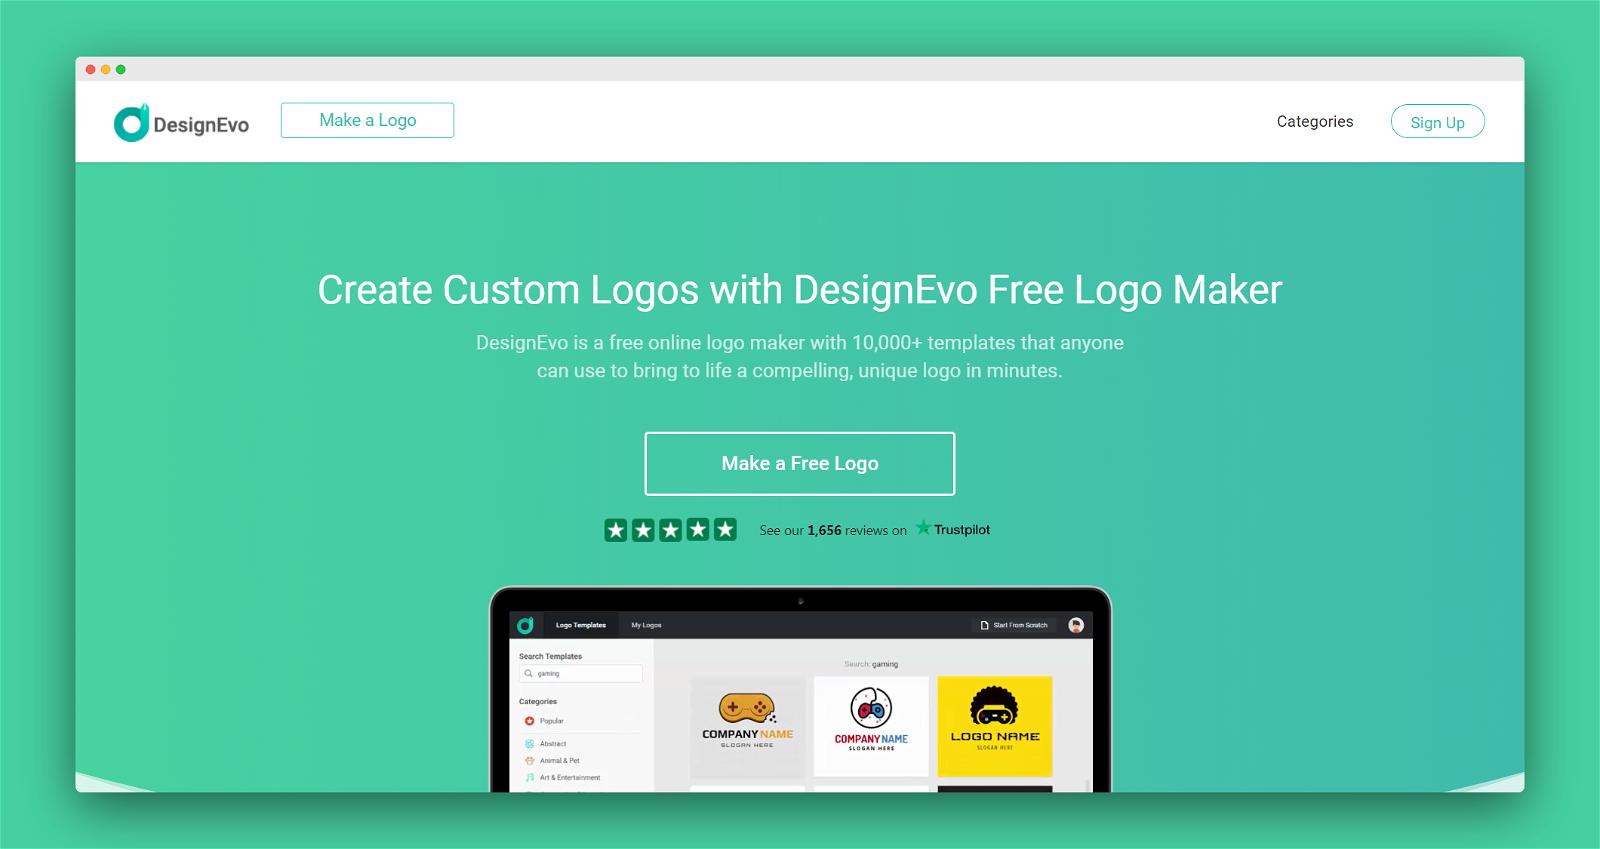 Design Evo Screenshot 1